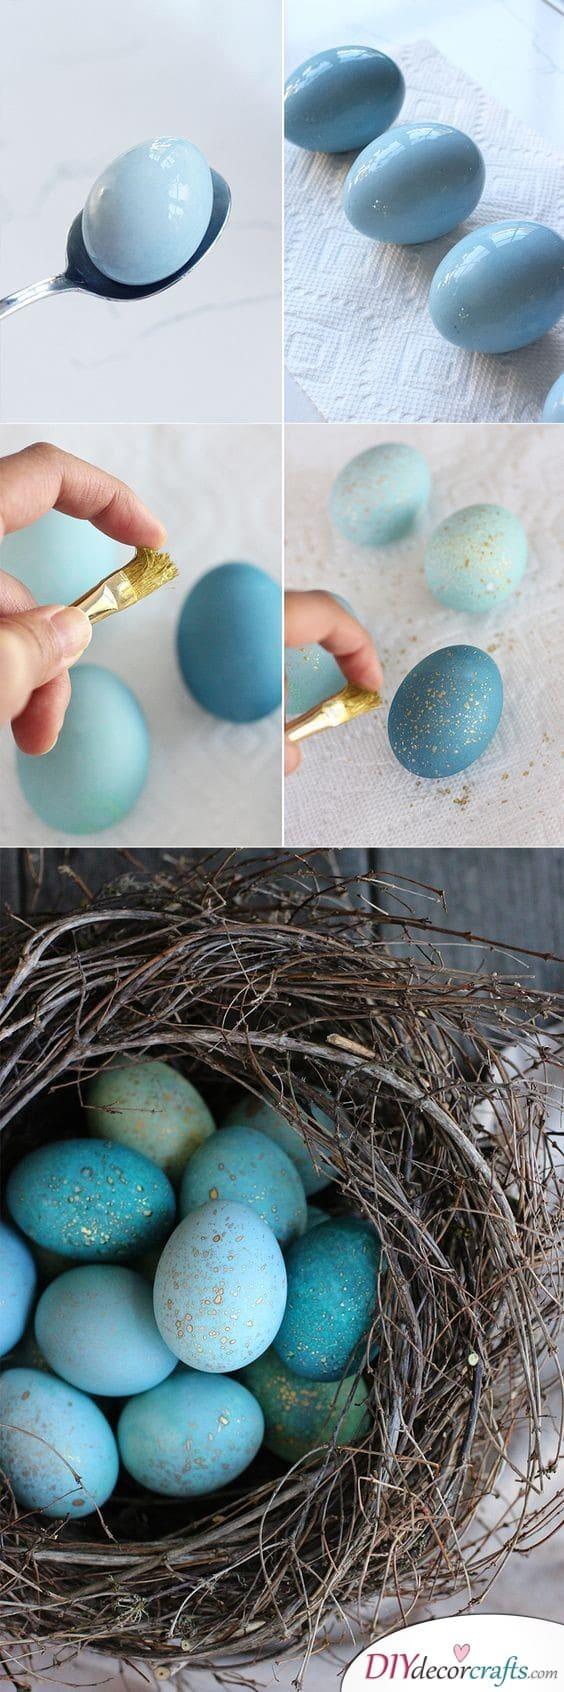 Robin Eggs - Beautiful and Blue